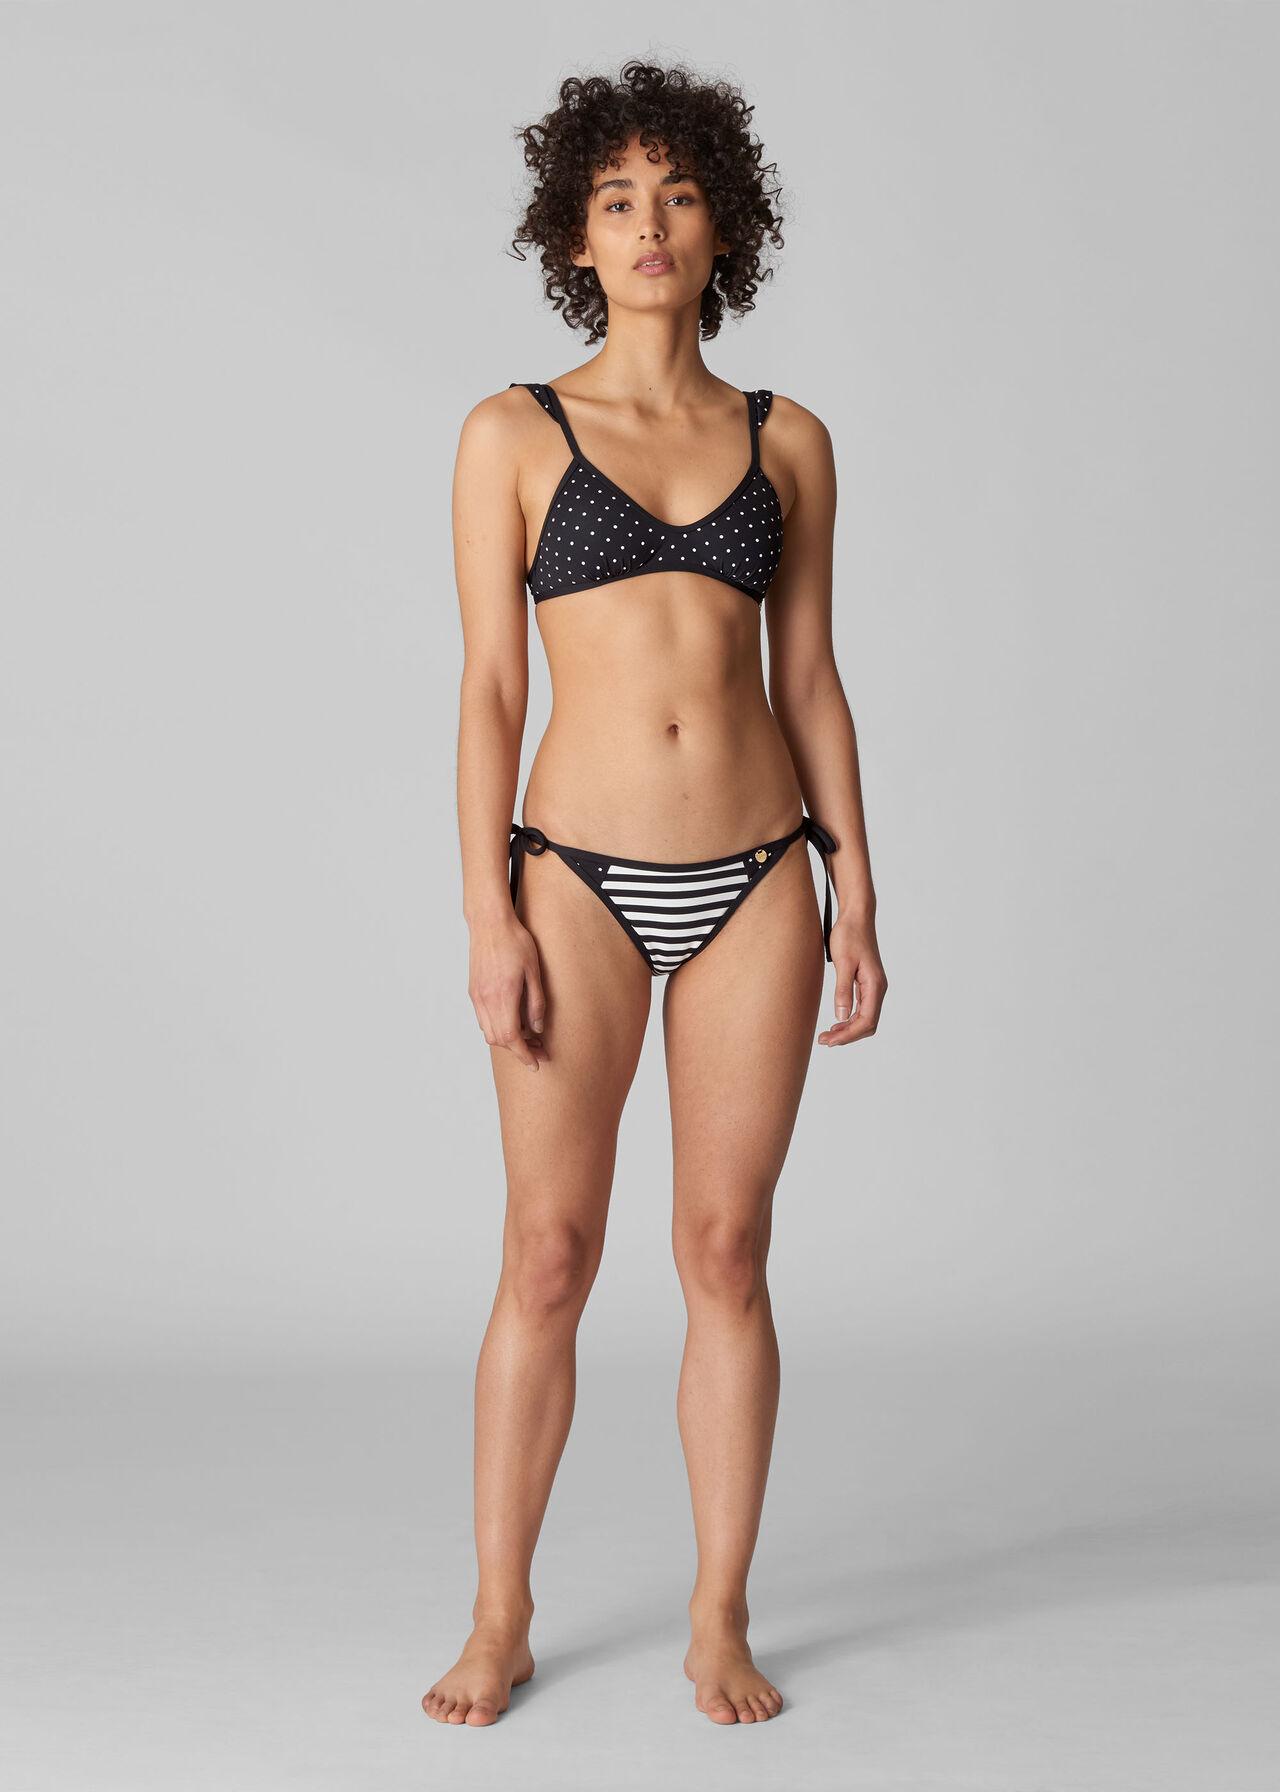 Santiago Spot Bikini Top Black and White